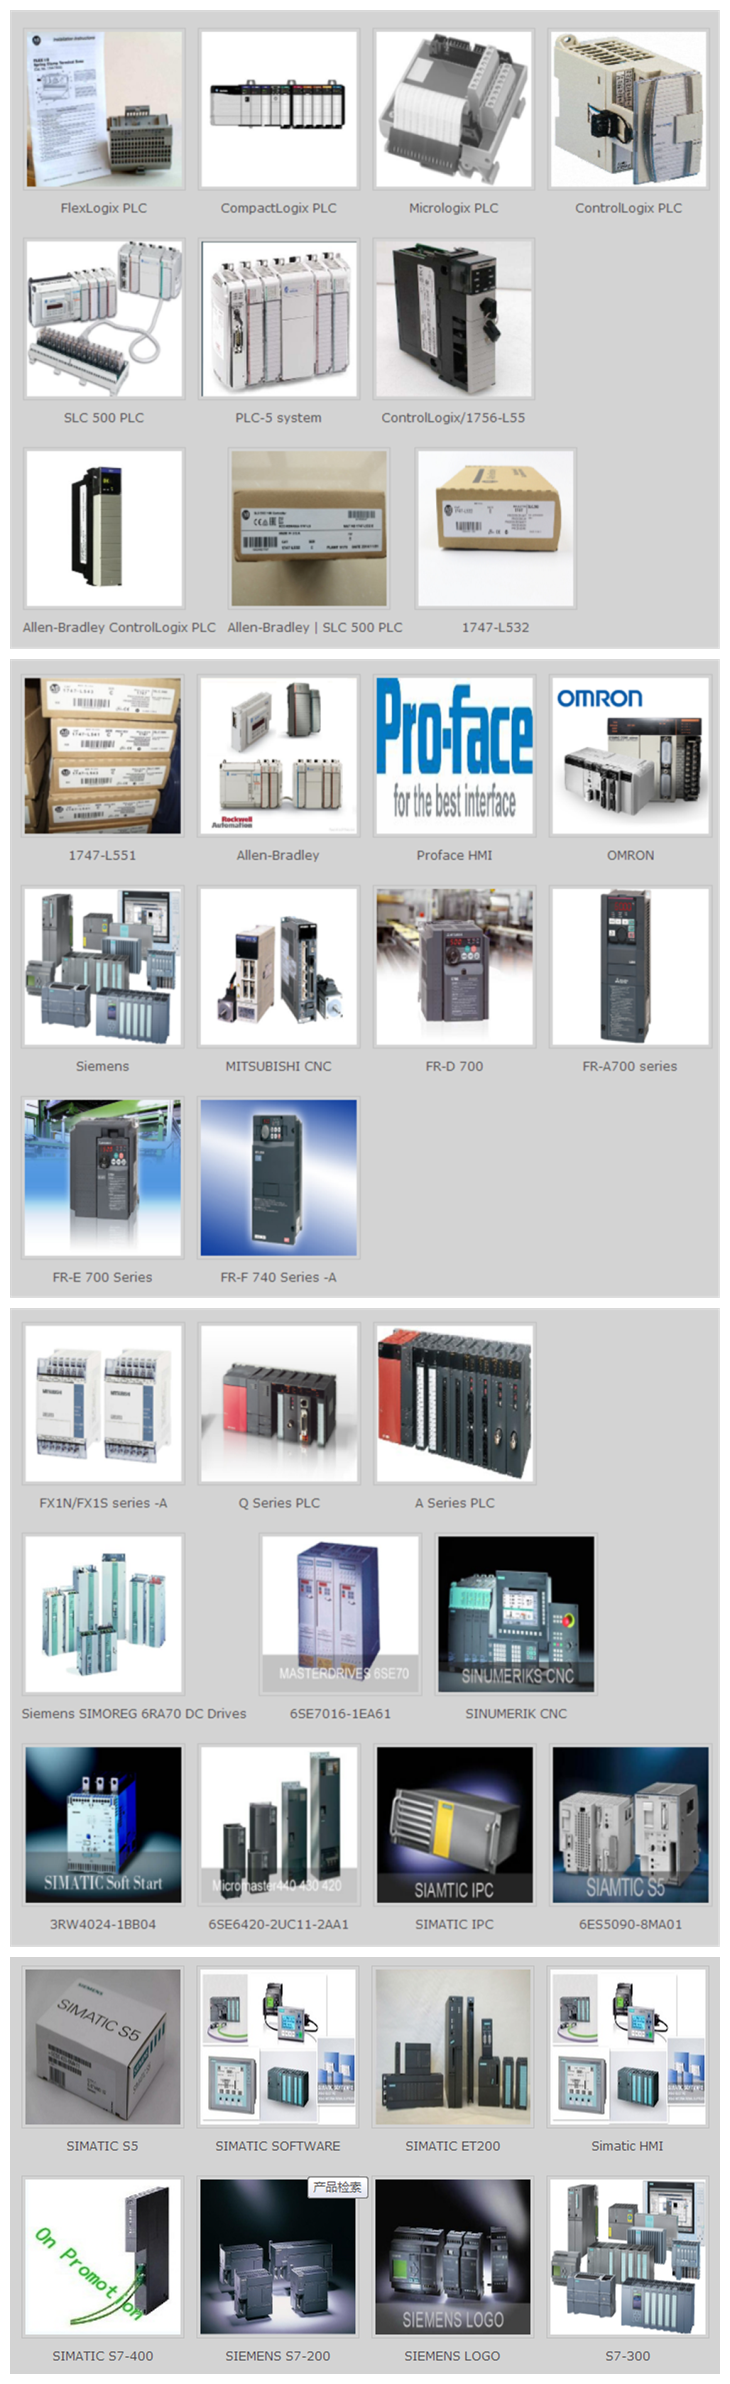 100% New and Original MITSUBISHI FR-F740 Series inverter driveFR-F740-3.7K-CHT